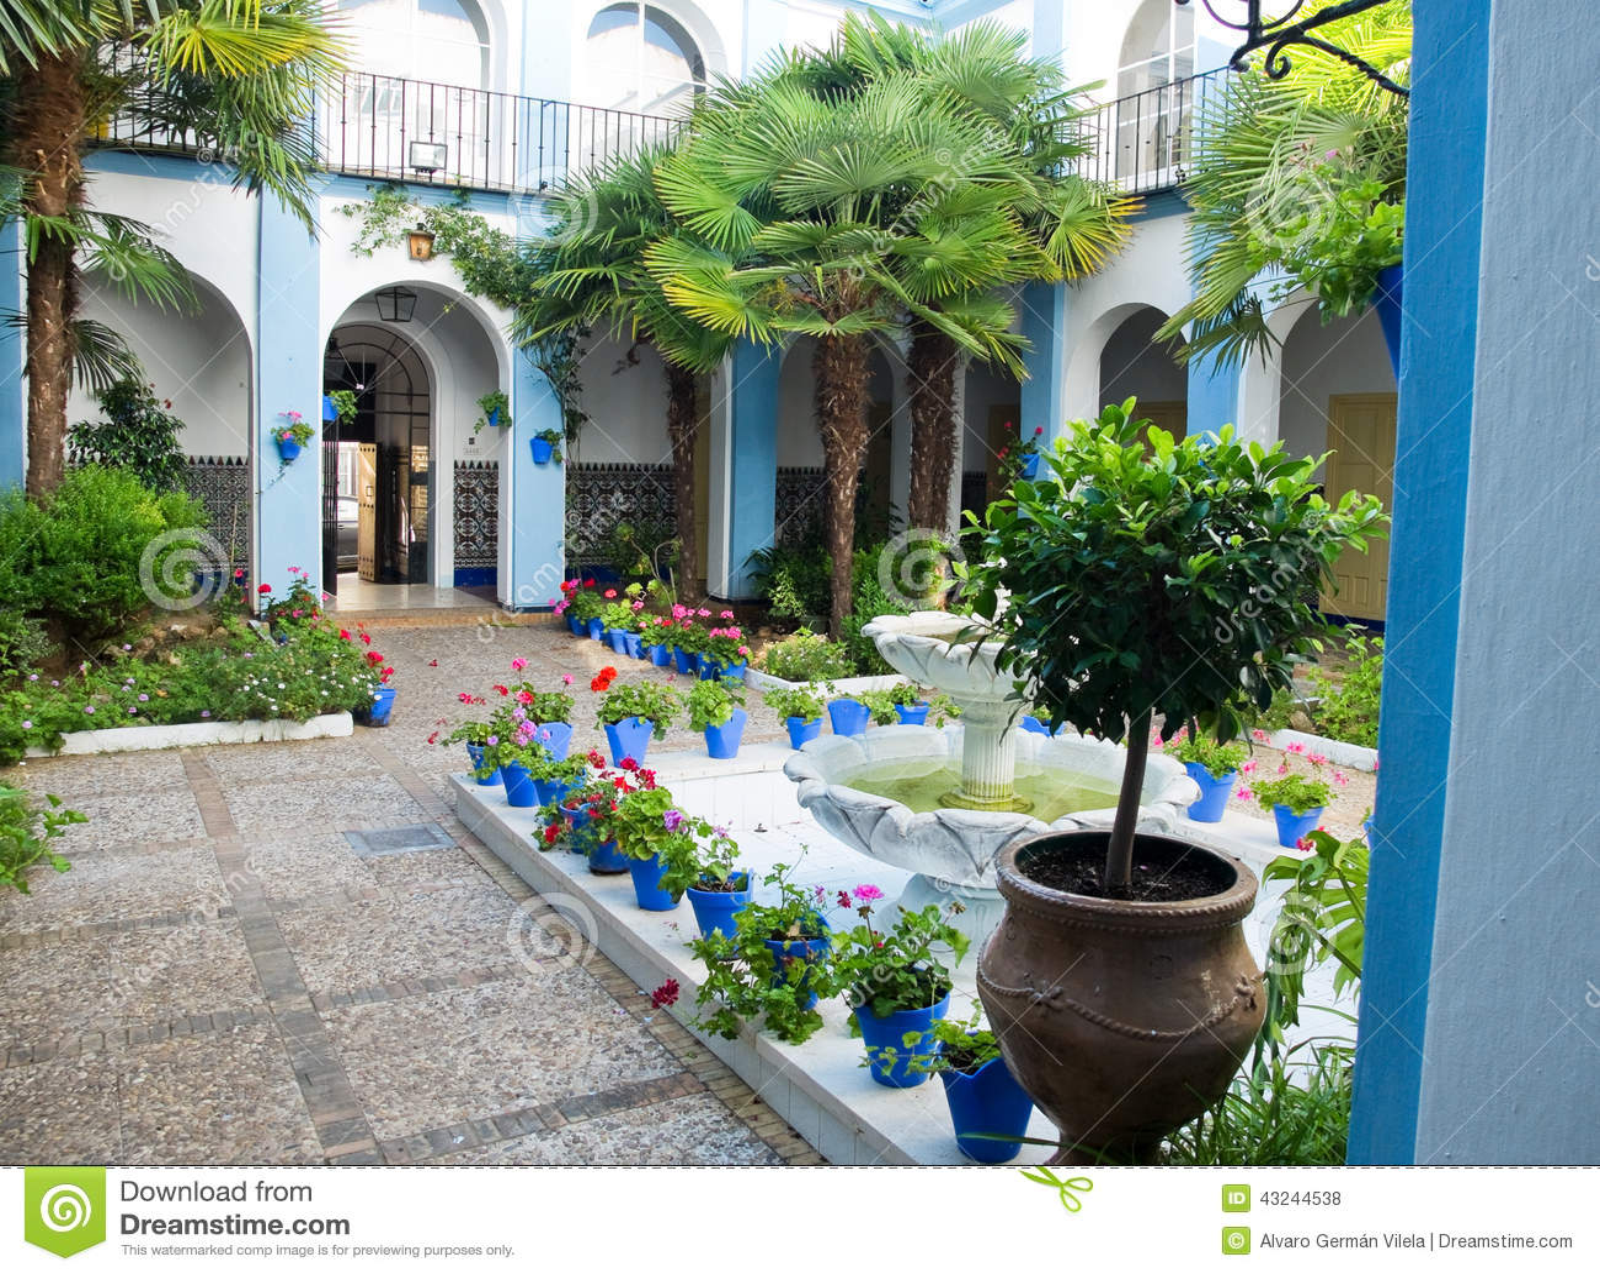 Typischer andalusischer patio in cordoba andalusien spanien stockfoto bild von patio blau - Imagenes de patios andaluces ...